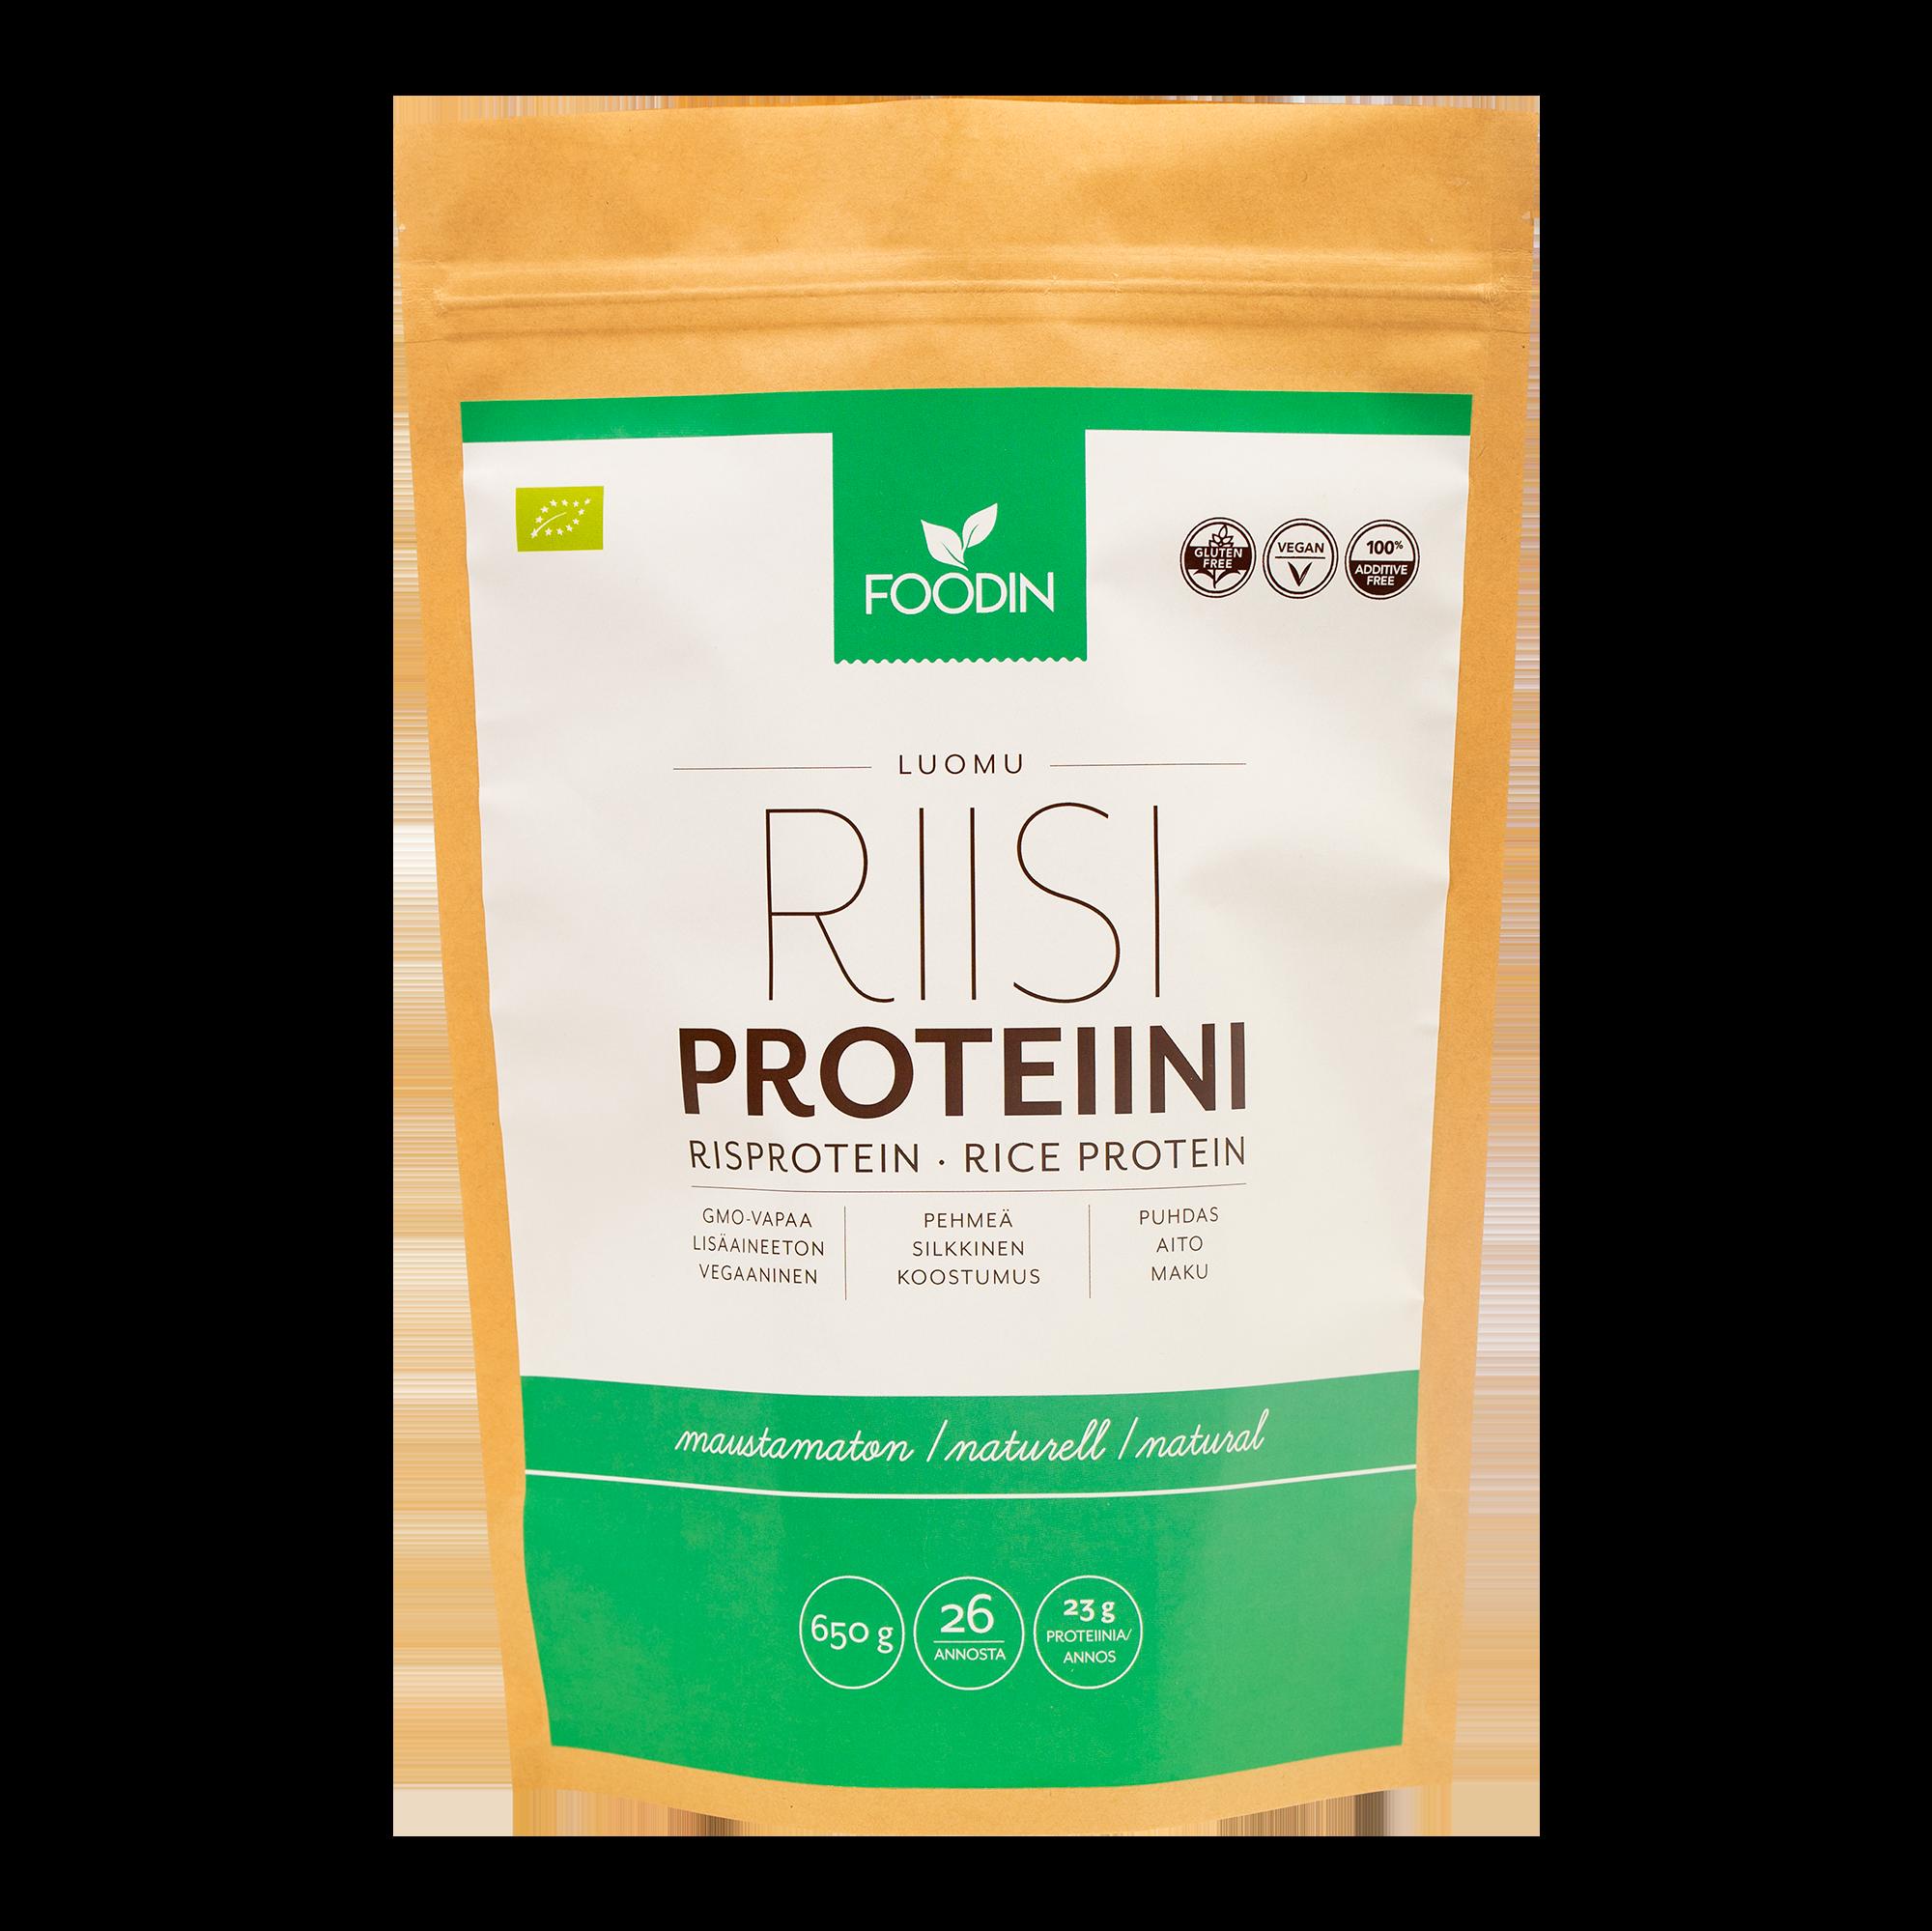 Riisiproteiini, Maustamaton, Luomu 2,5 kg